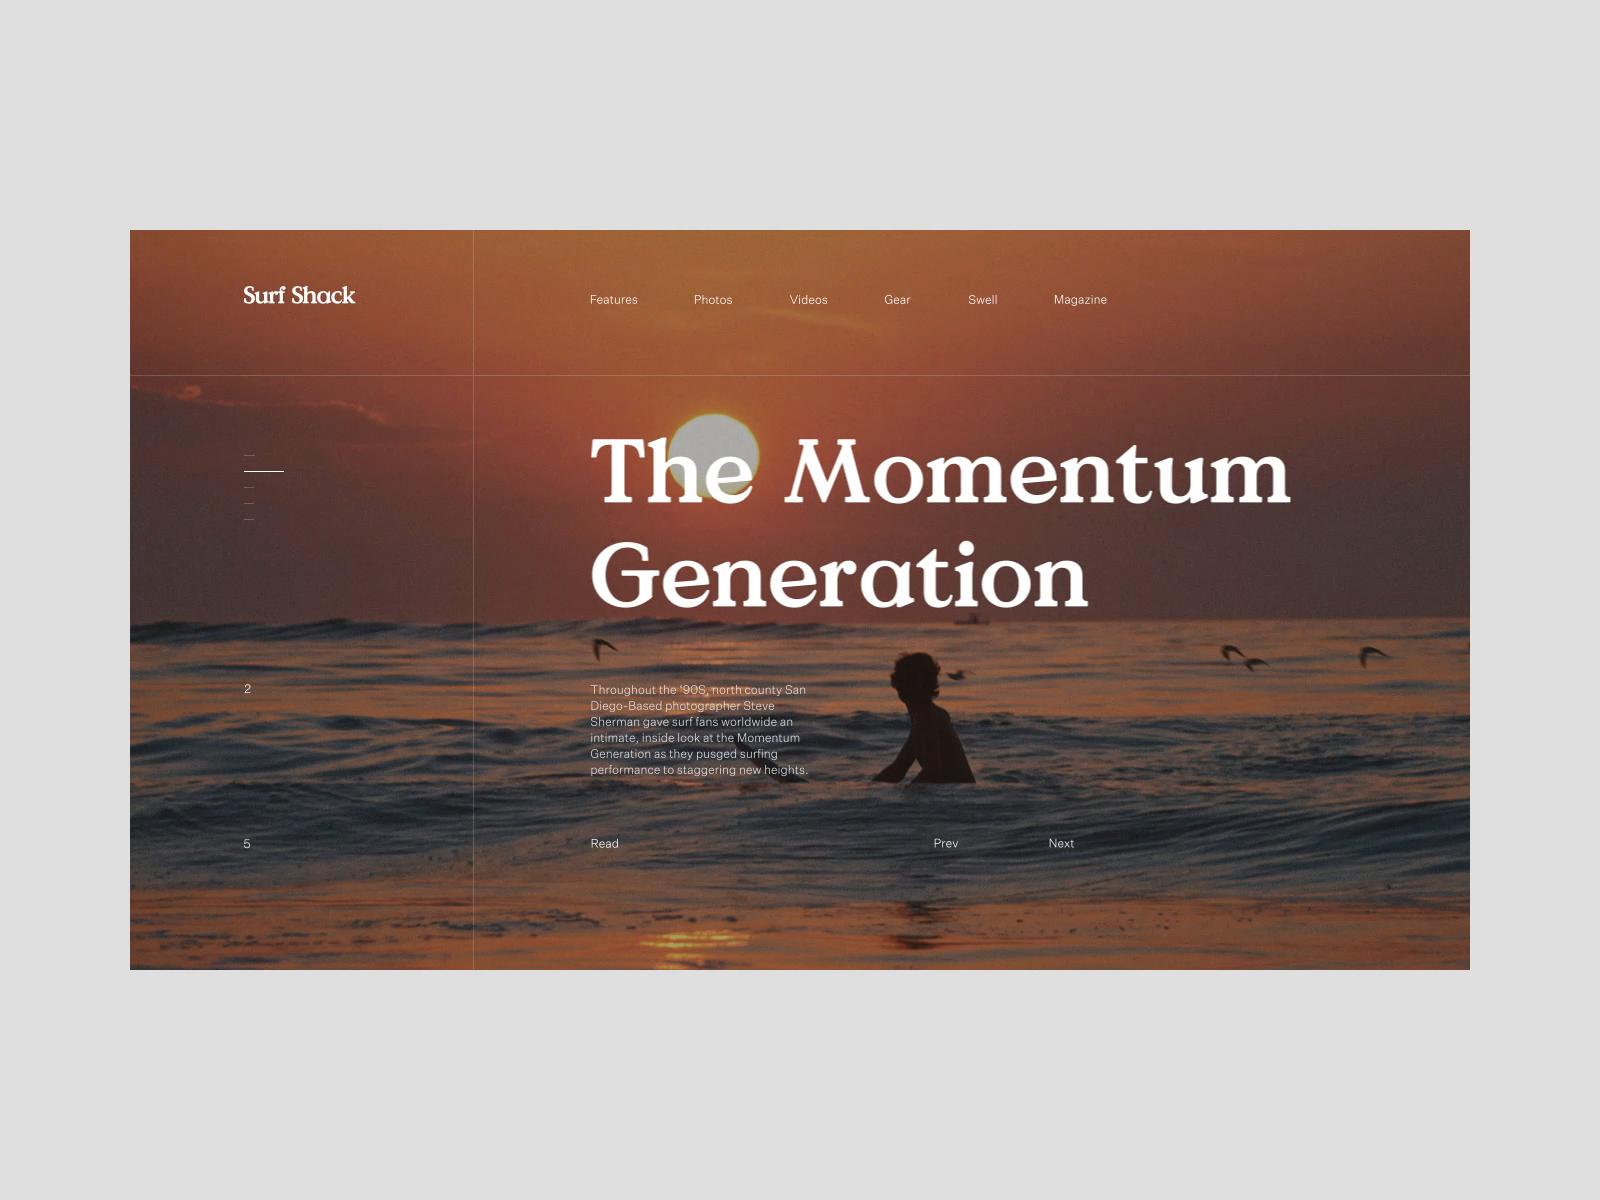 Surf Shack Article